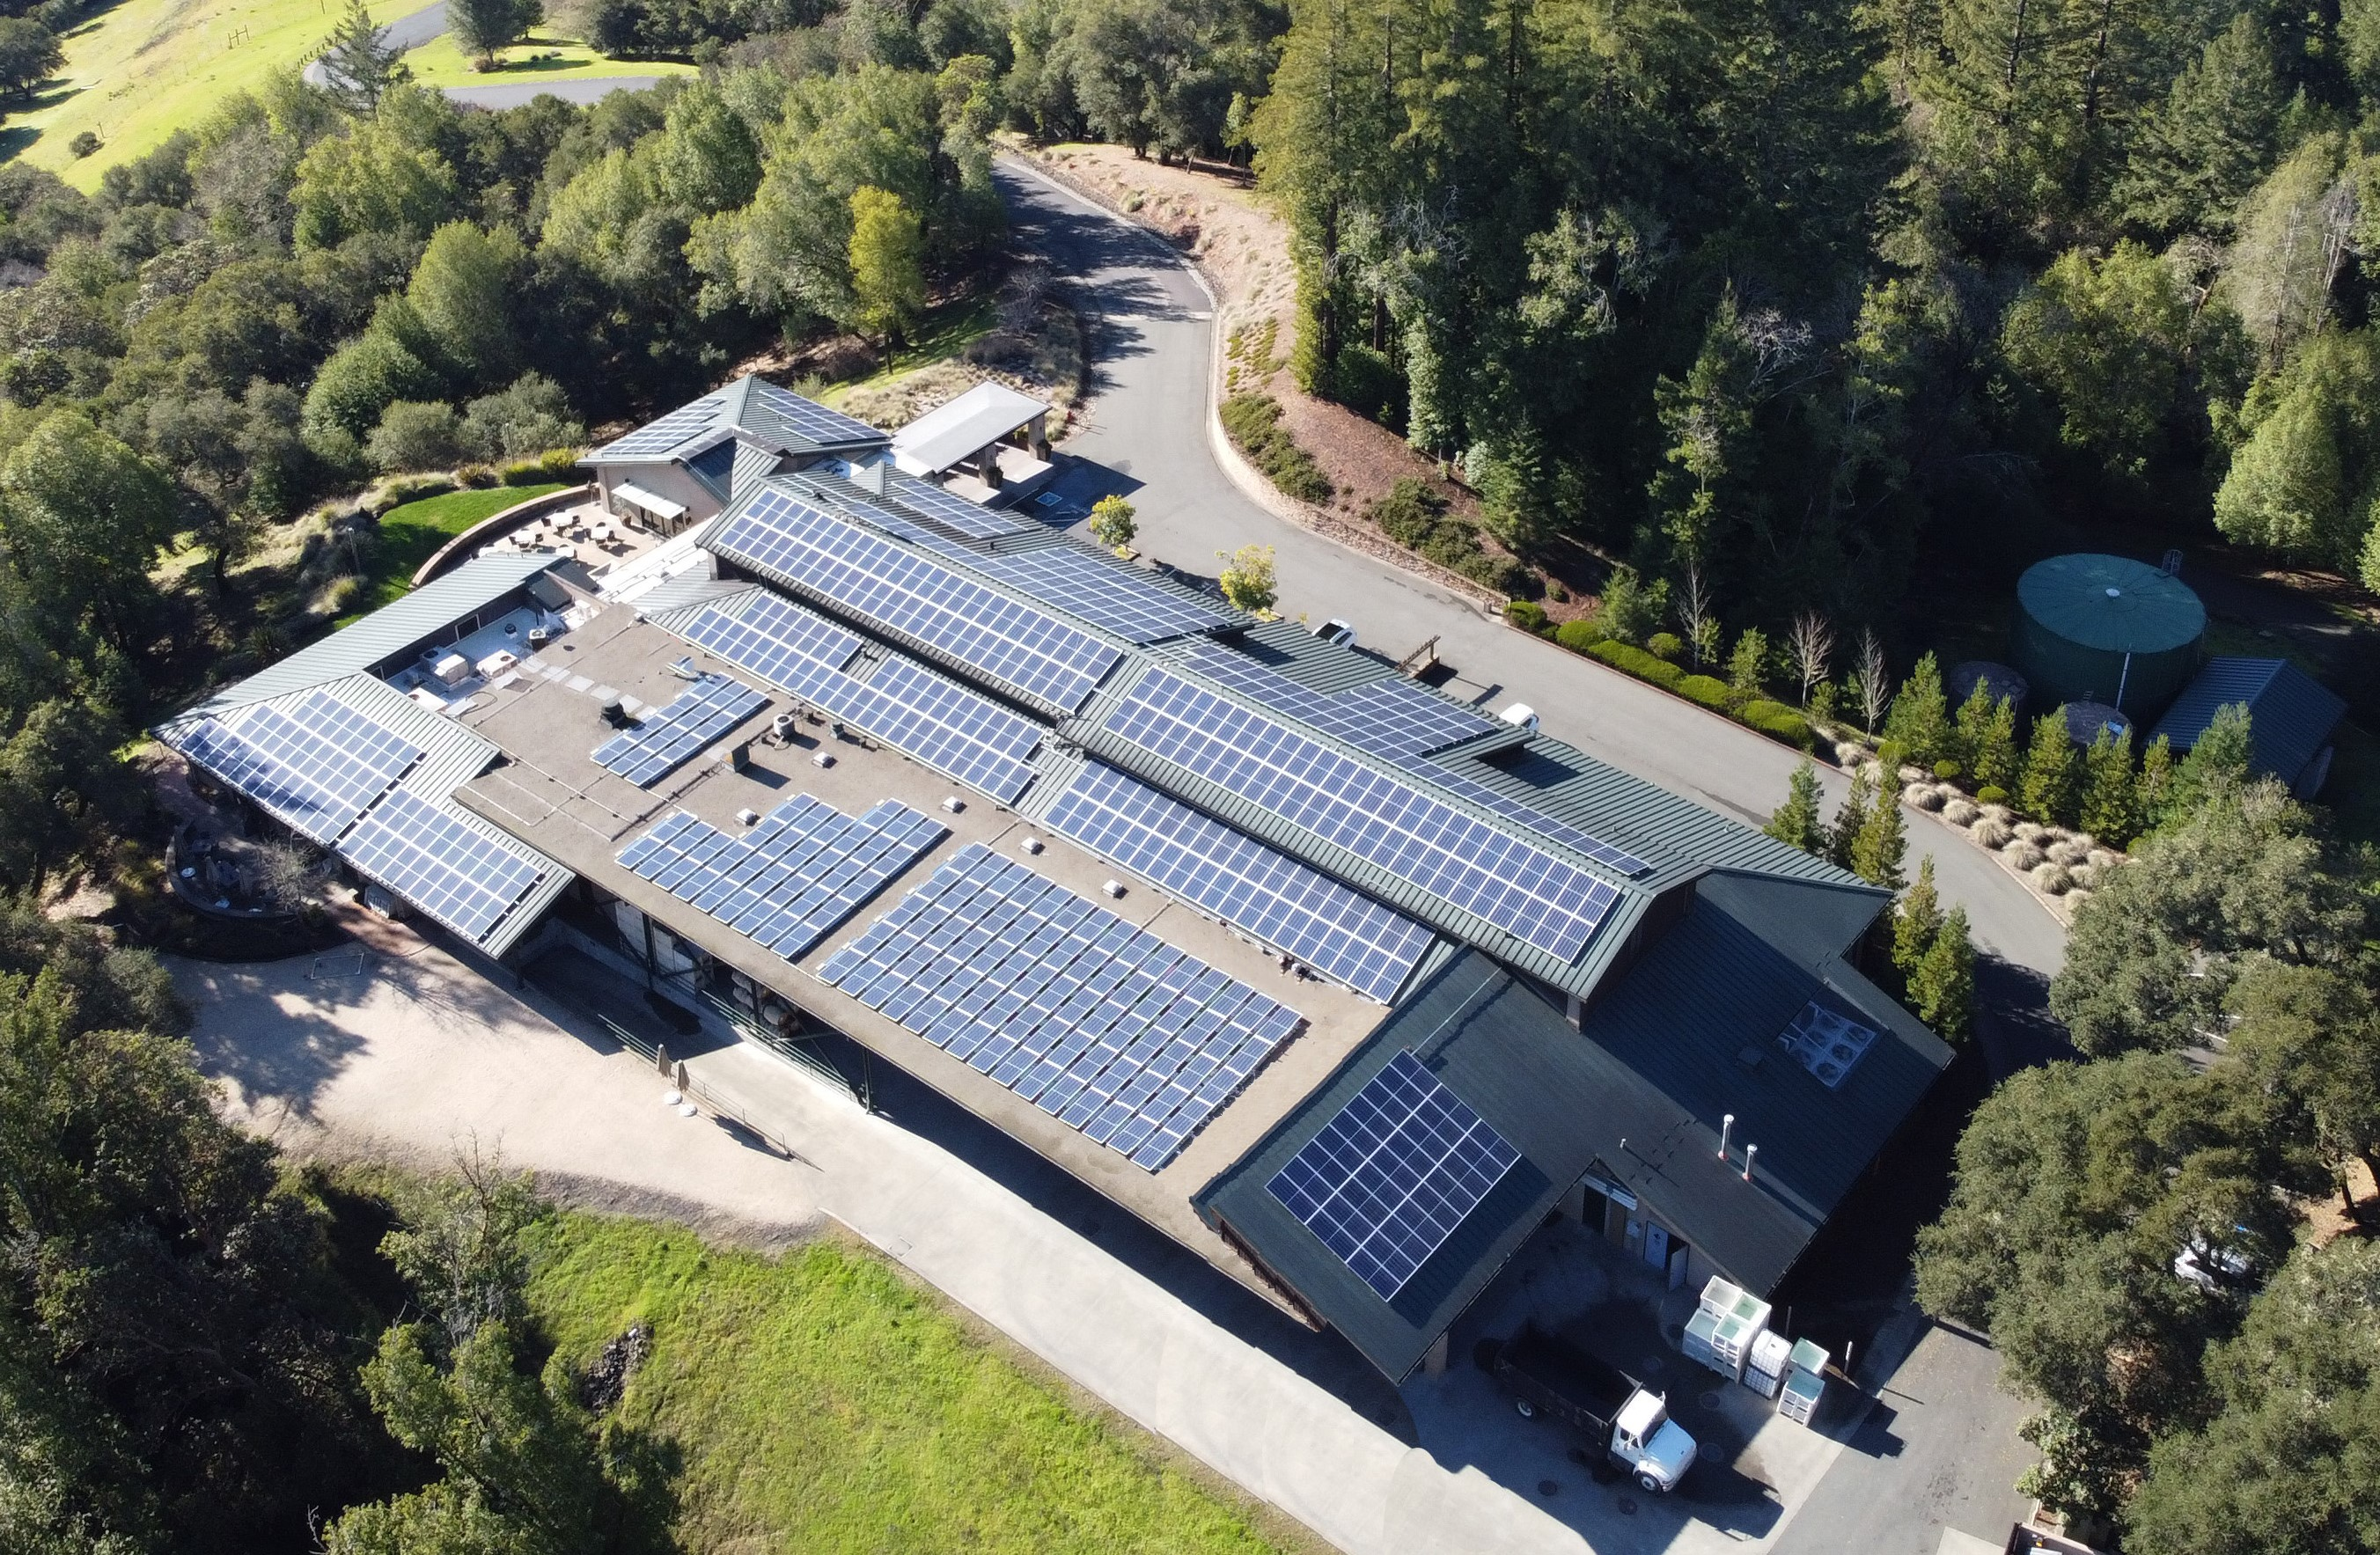 SolarCraft Completes Solar Power  Installation at Gary Farrell Vineyards & Winery - Celebrated Healdsburg Winery Toasts Energy Savings